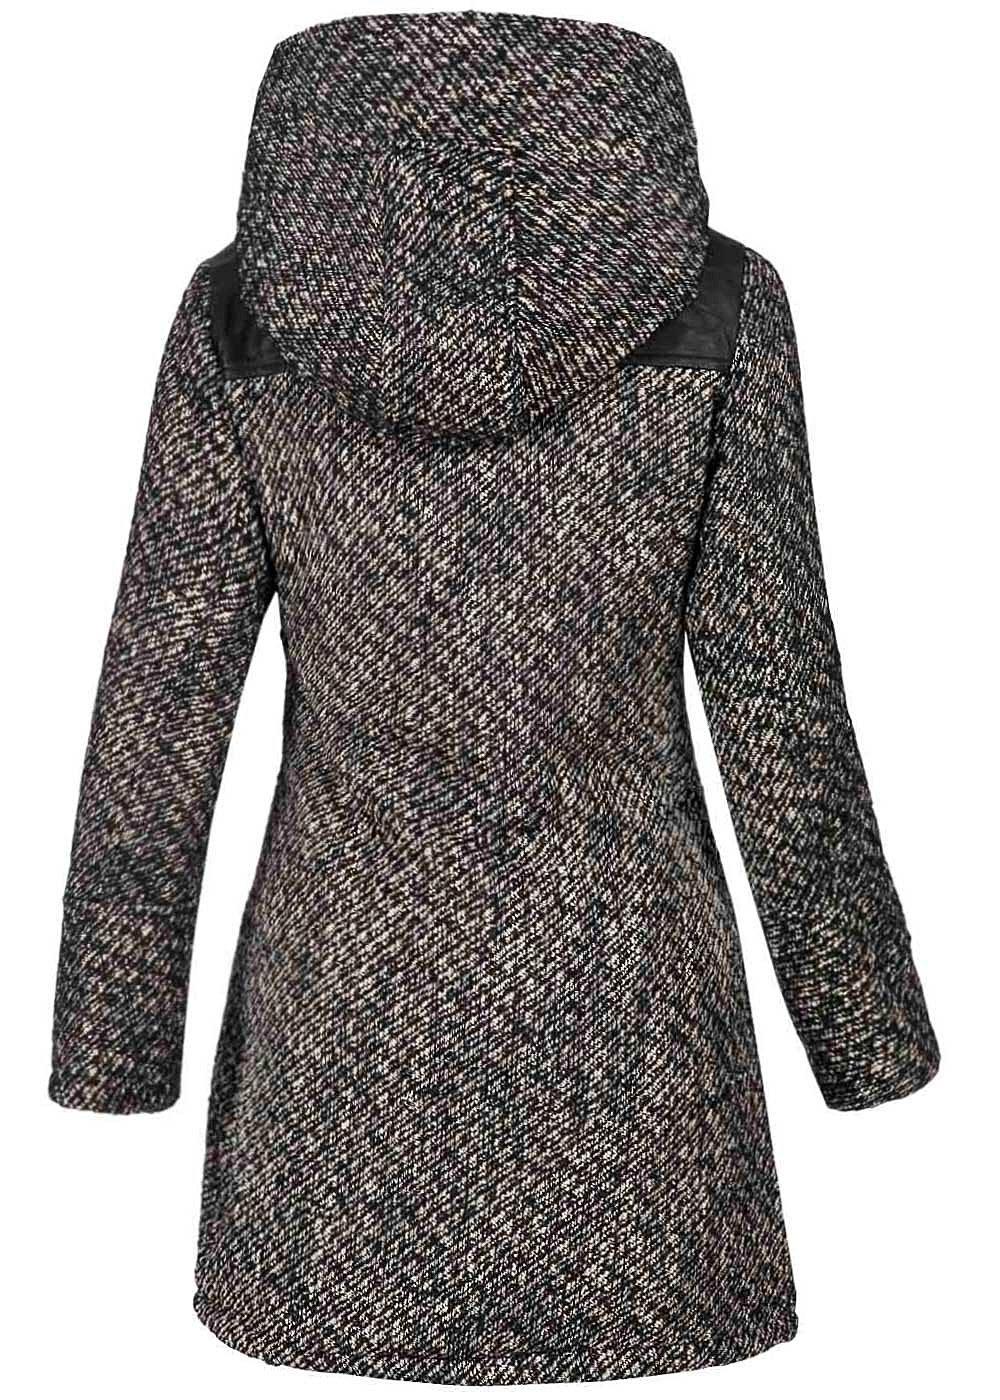 eight2nine damen winter mantel gro e kapuze fleecefutter. Black Bedroom Furniture Sets. Home Design Ideas